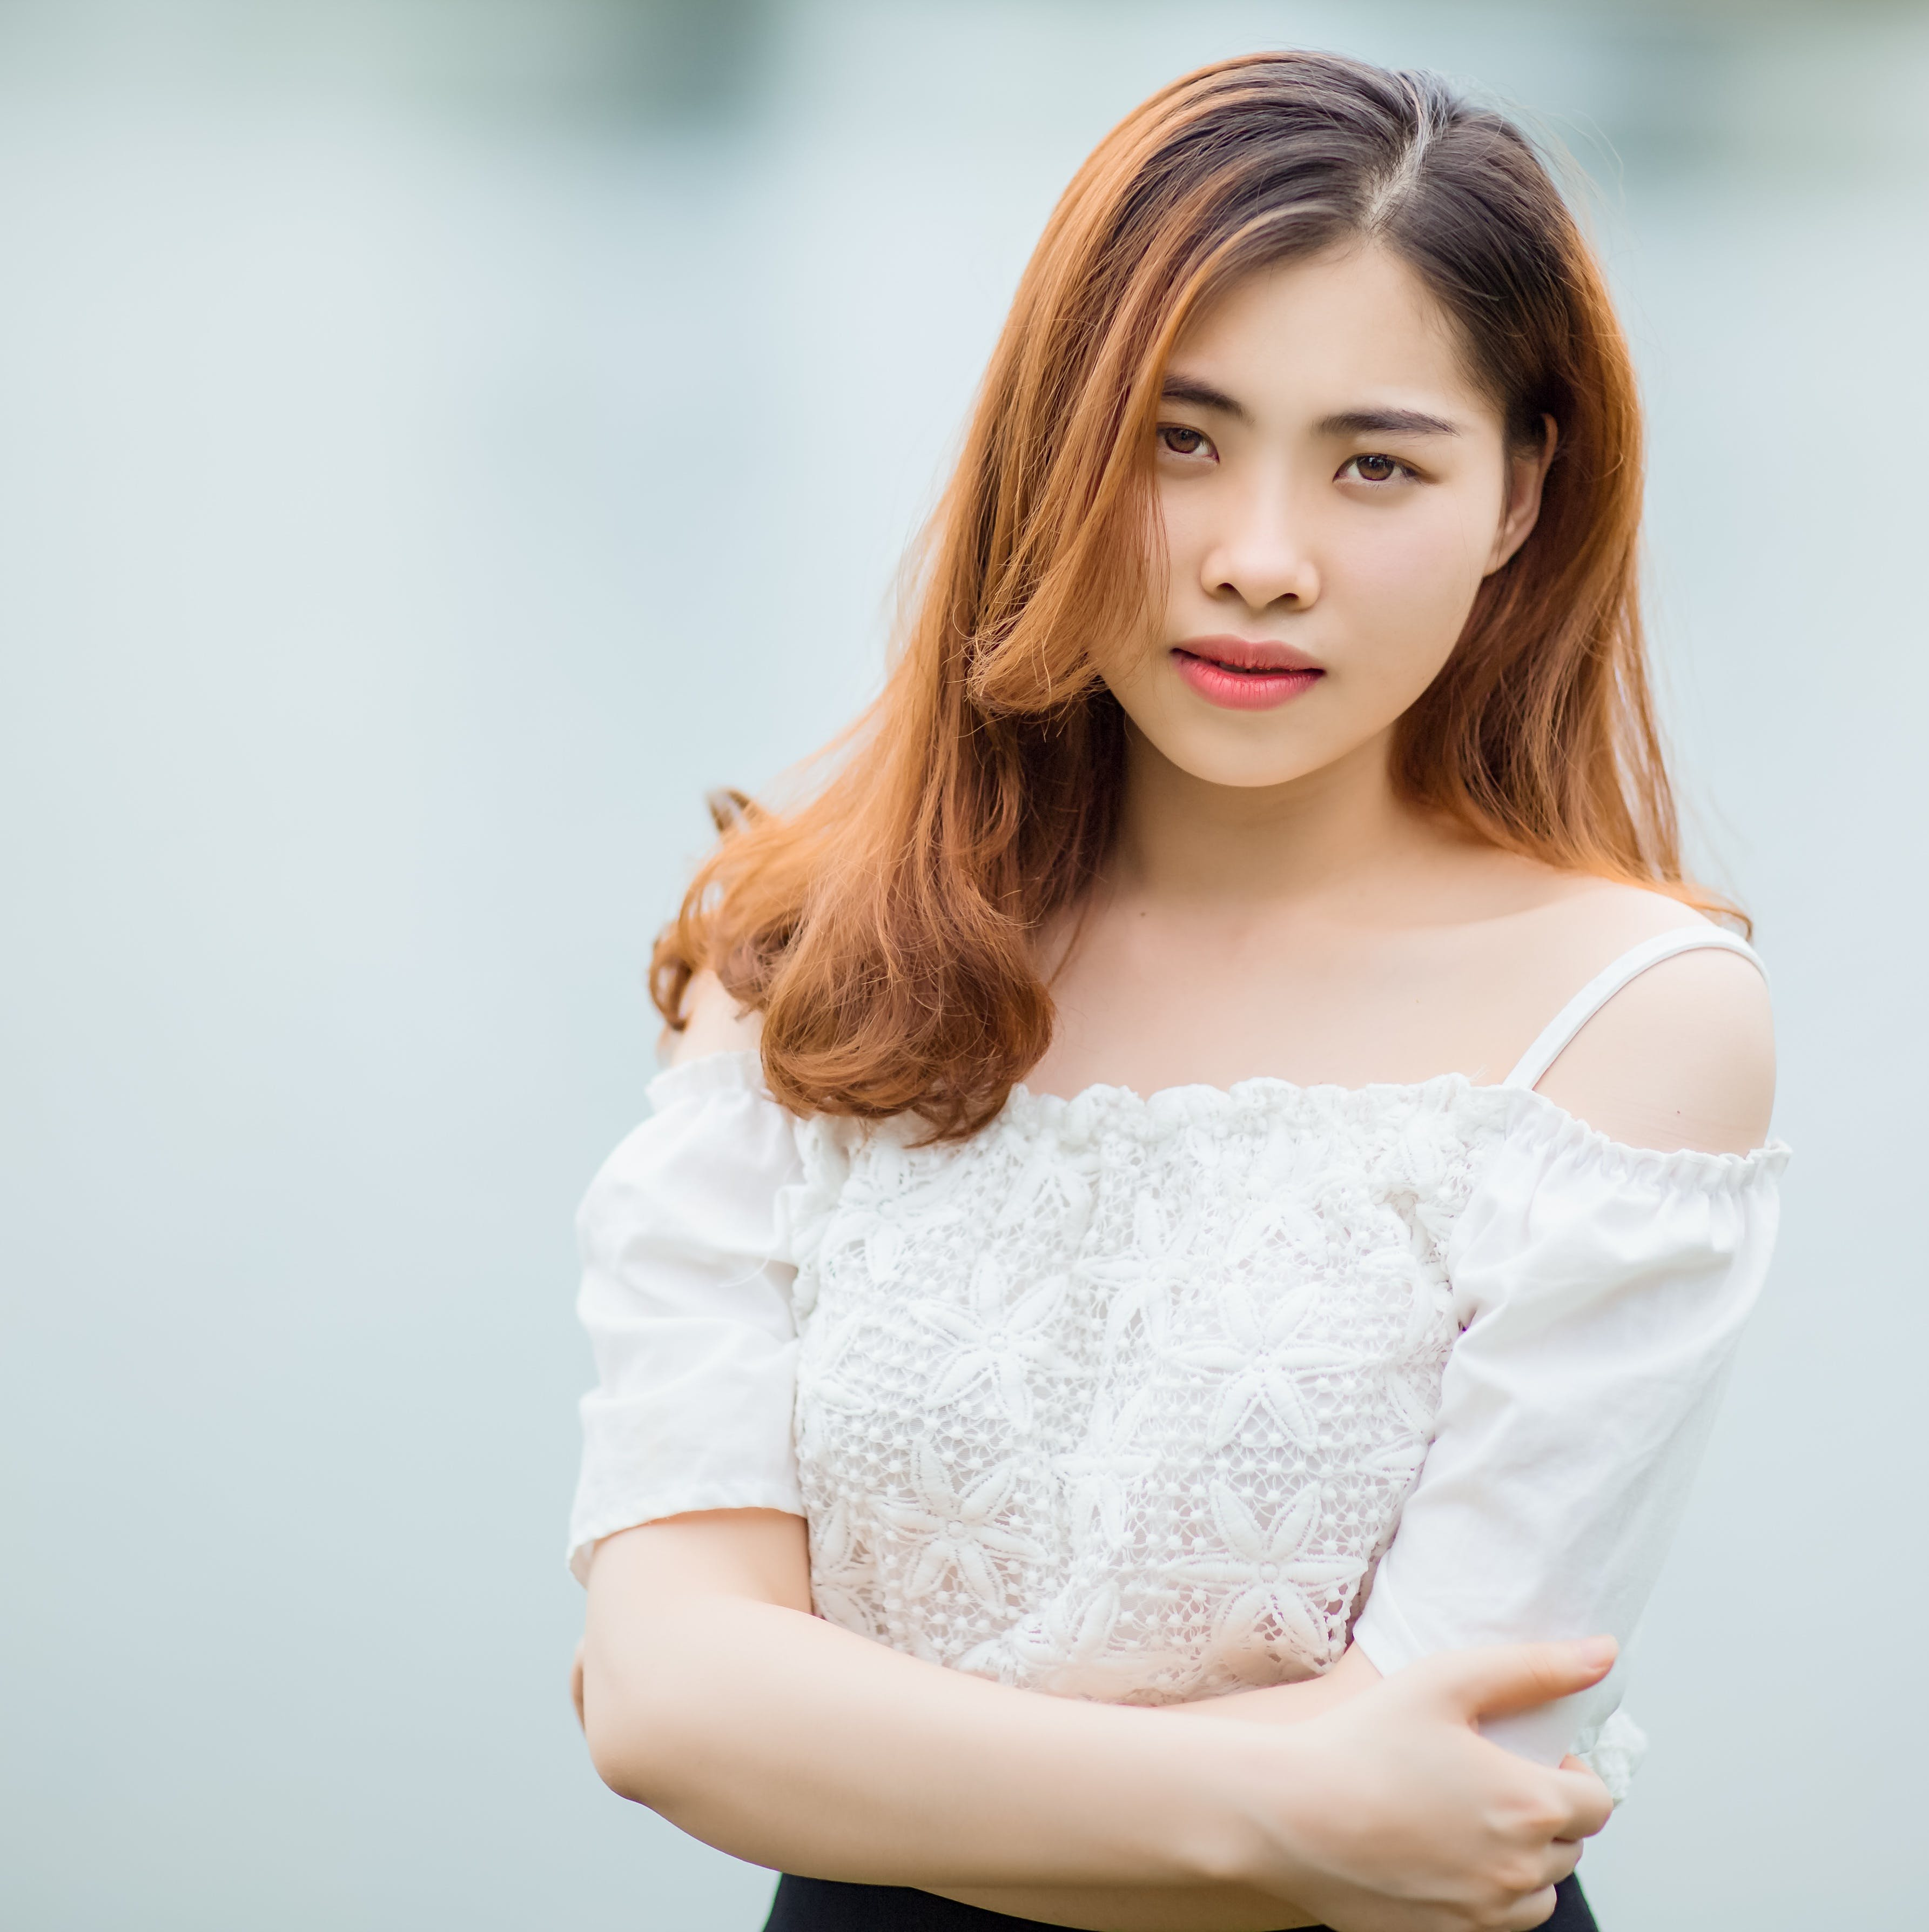 adolescent, Asian, attractive